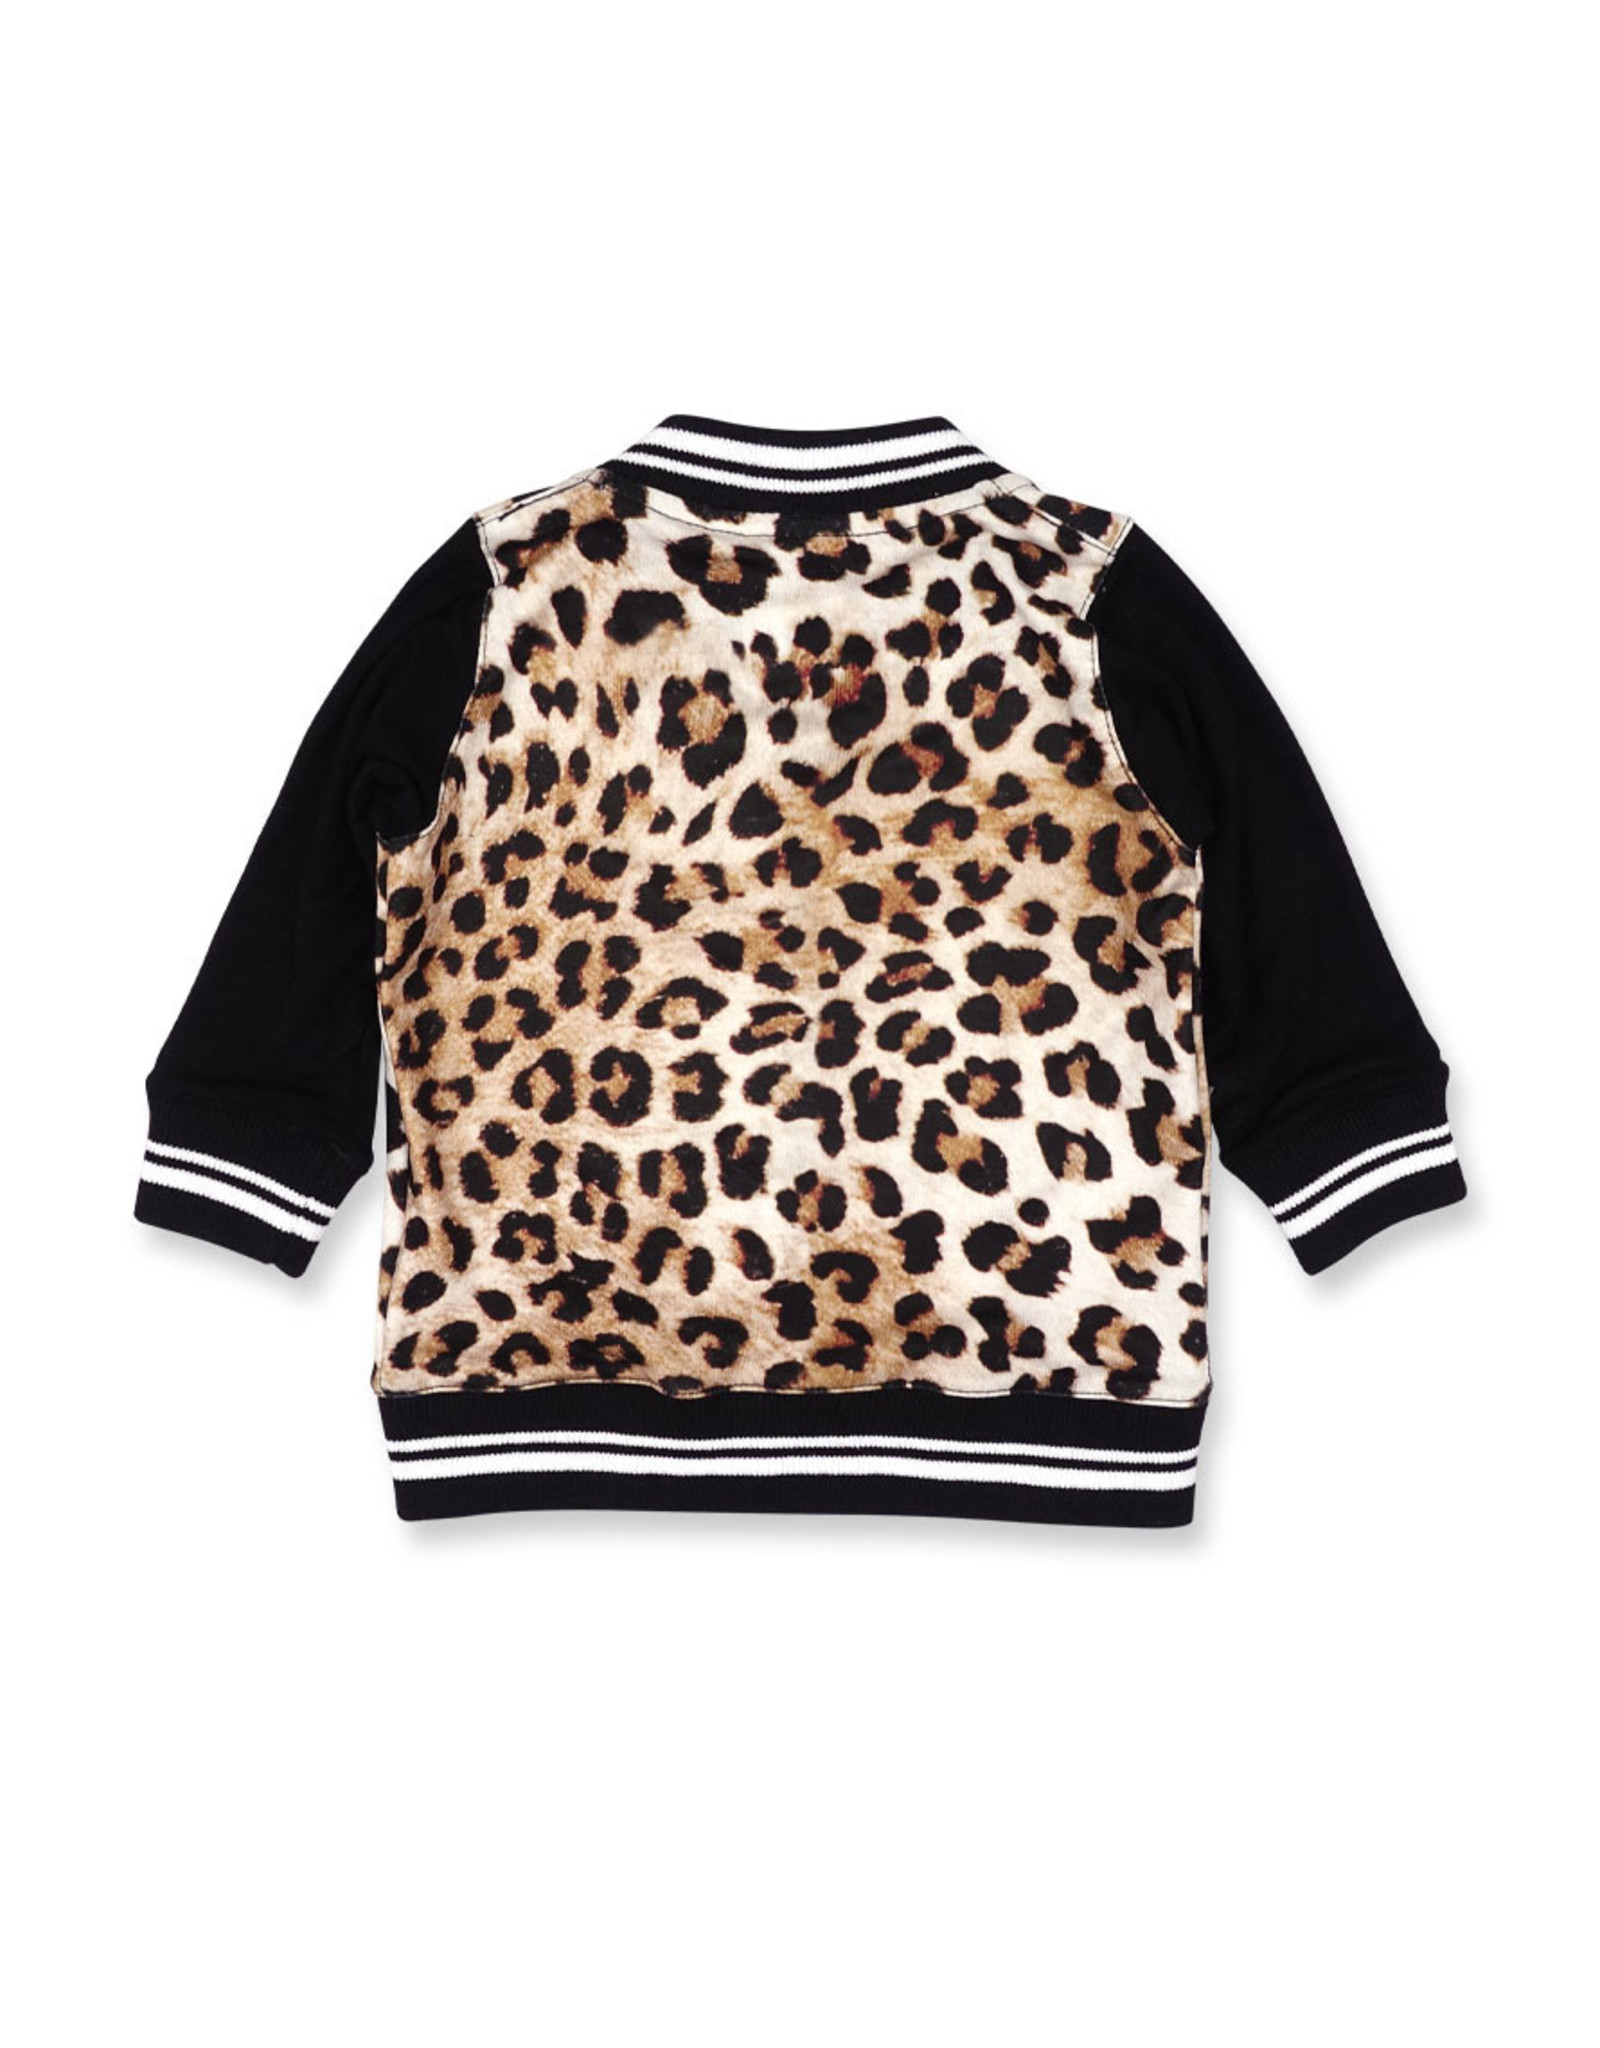 SIX BUNNIES - Leo Plush Jacket